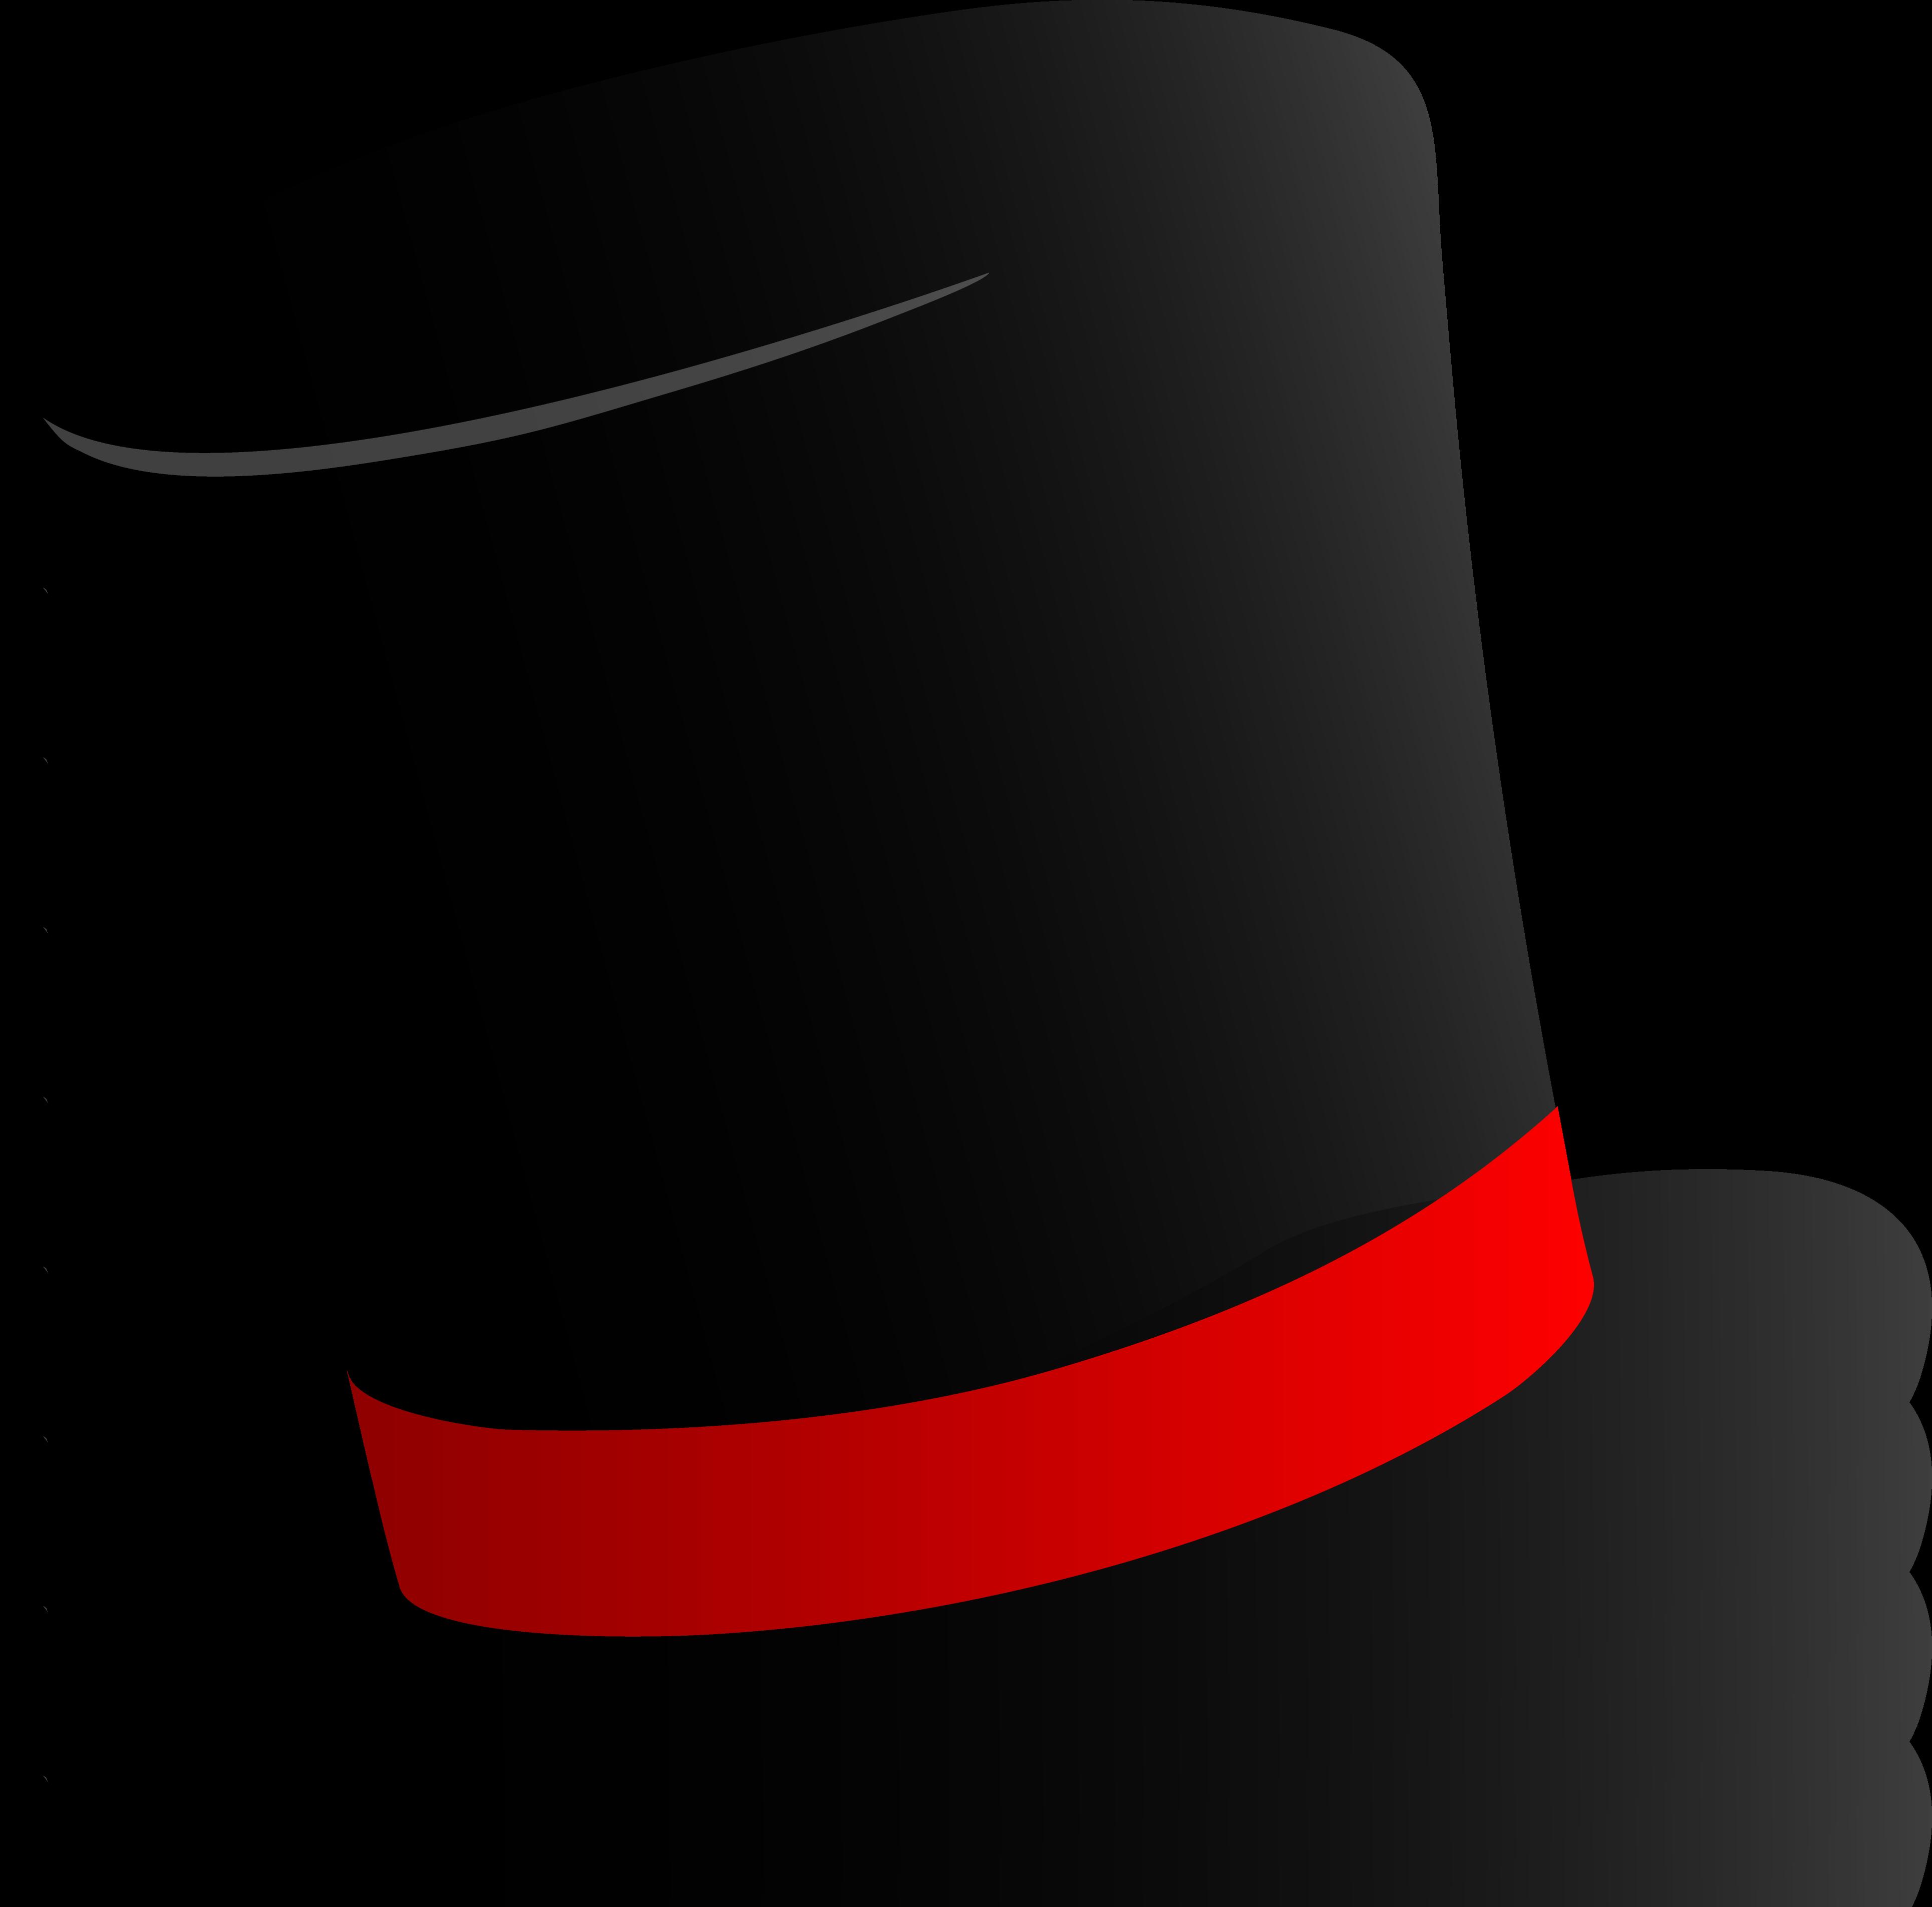 3858x3809 Magic Hat Png Transparent Images Png All